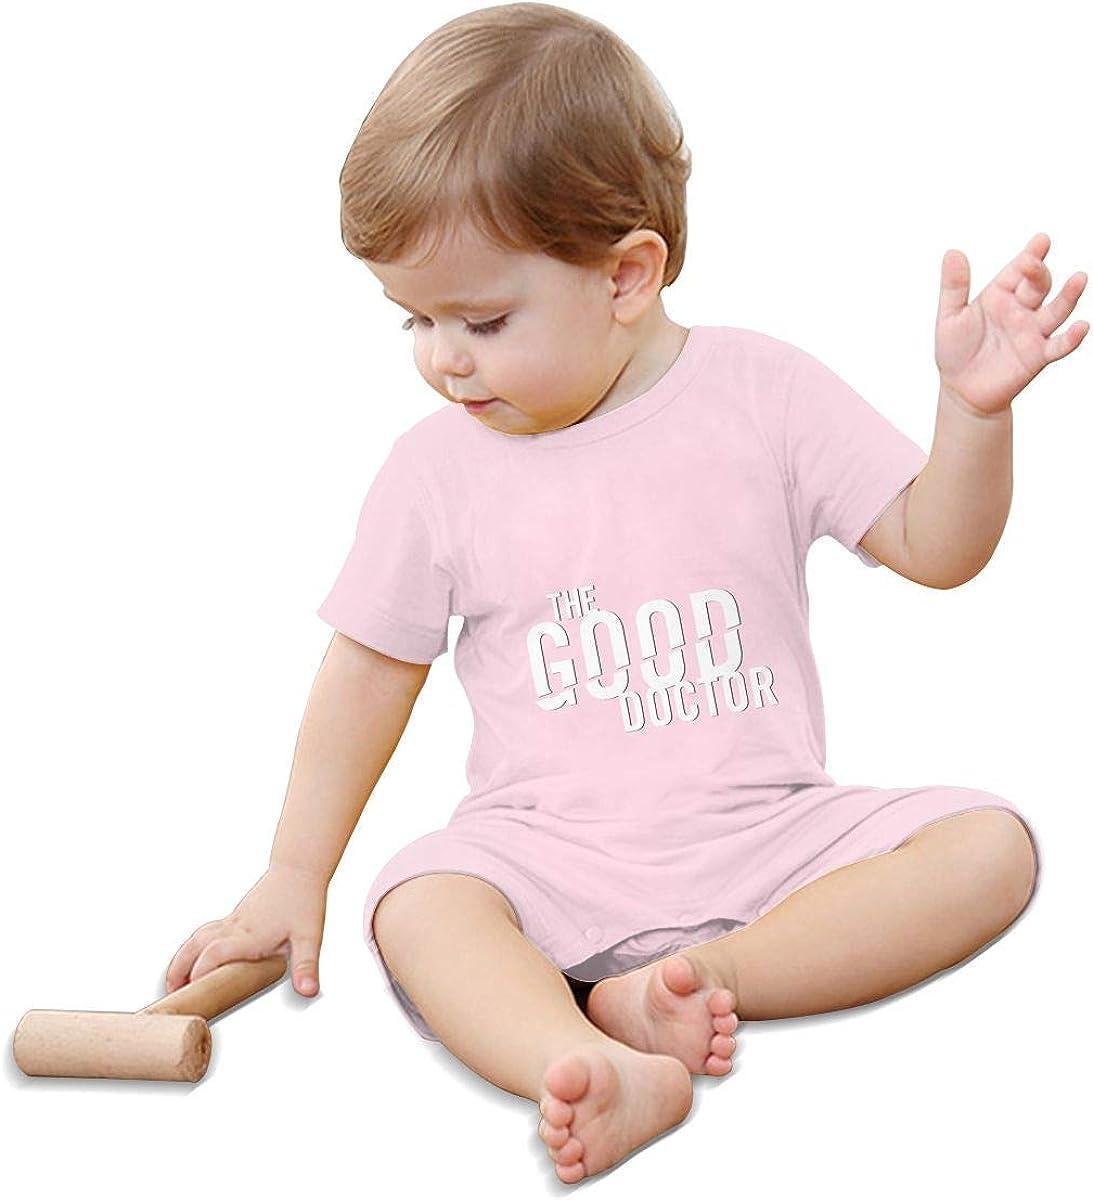 Gerneric The Good Doctor Logo Newborn Baby Cotton Shortsleeve Bodysuits Jumpsuits Pink